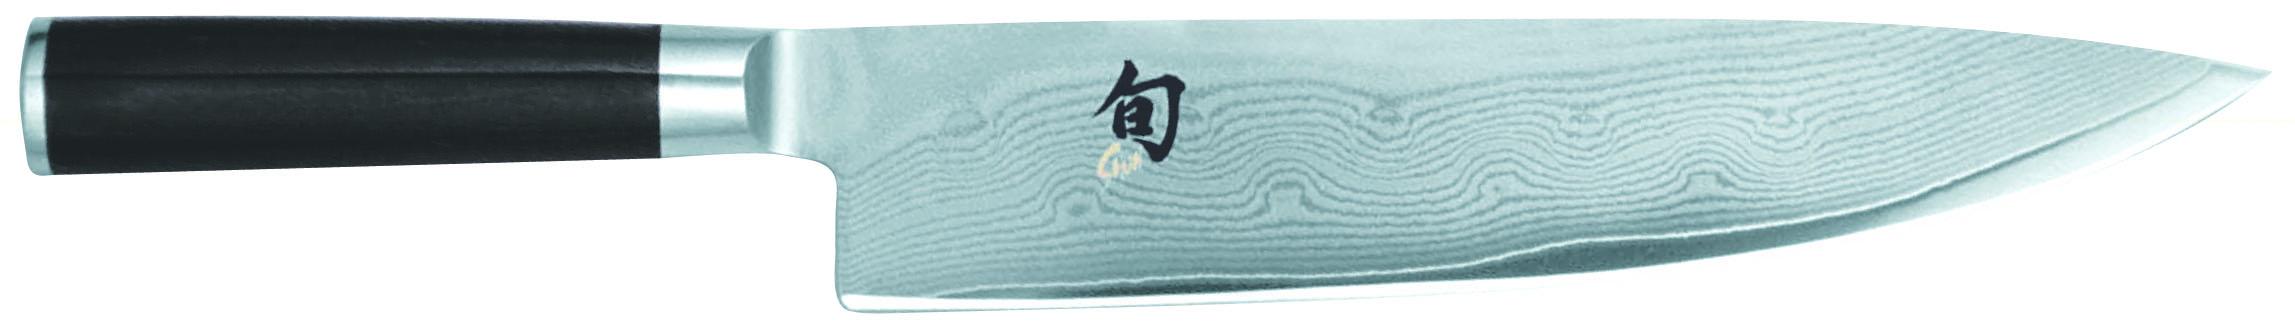 Kai Shun Classic DM-0707 Kockkniv 255 cm